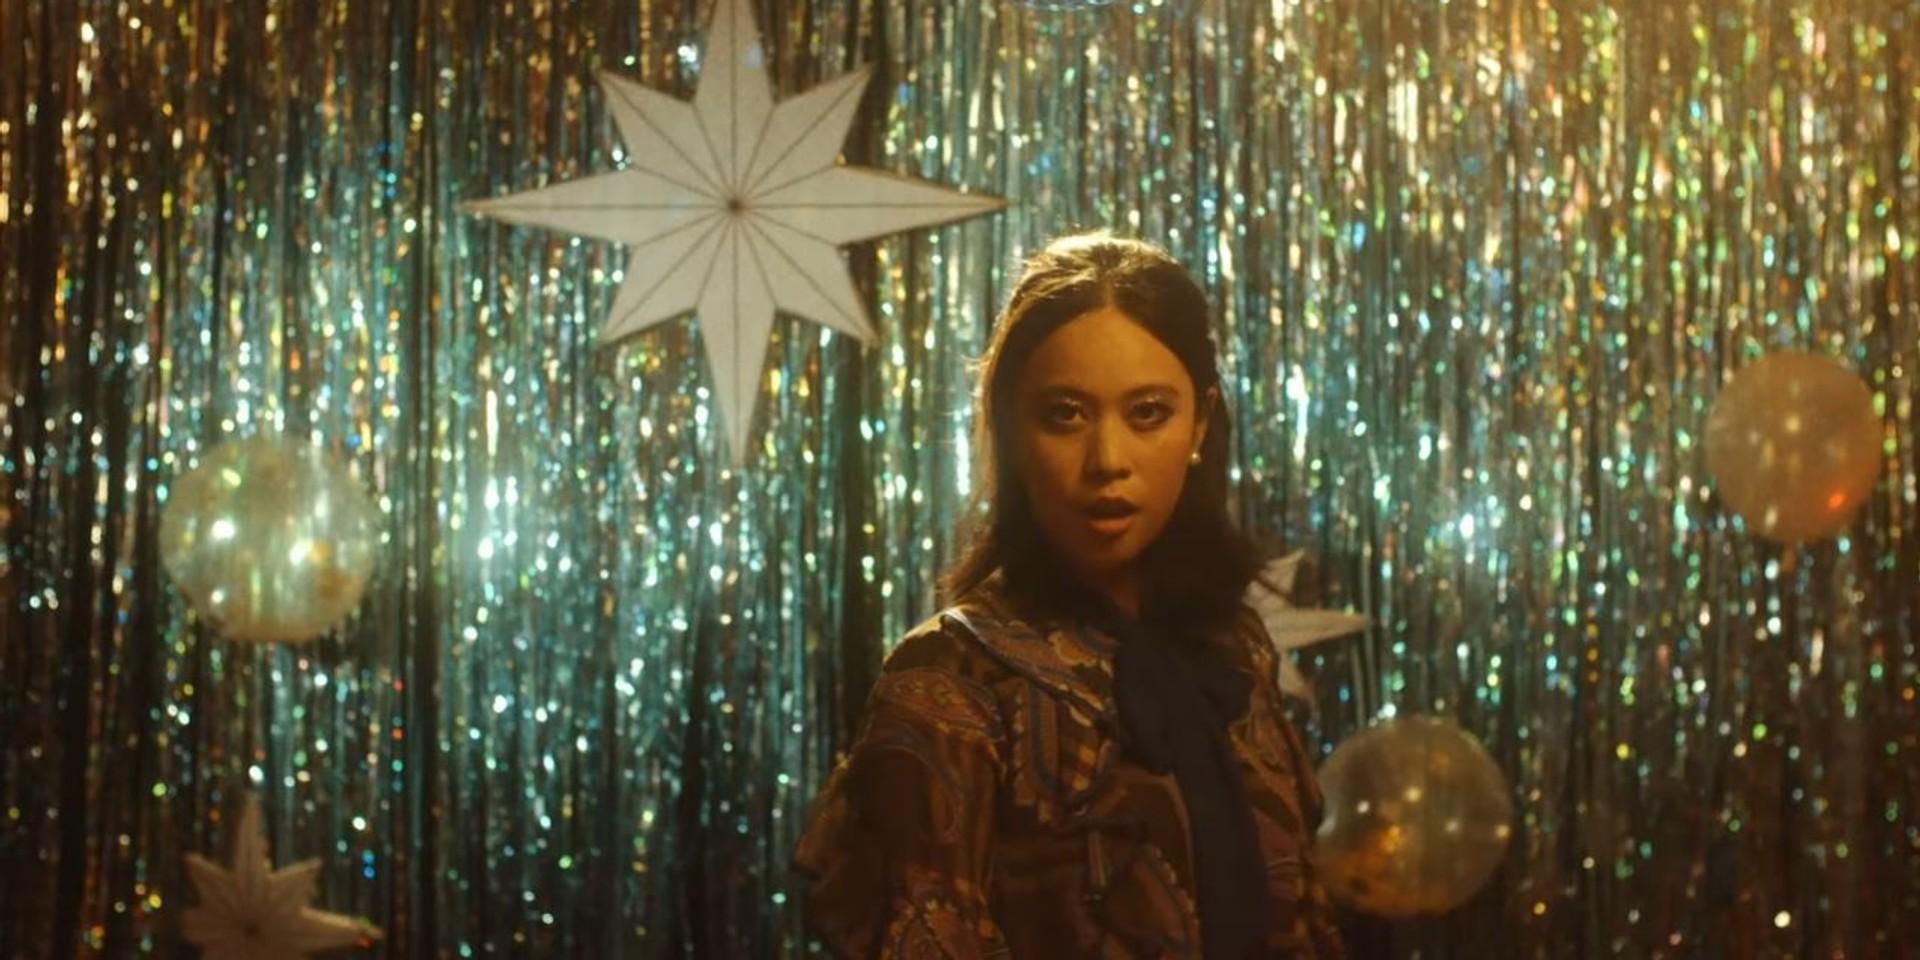 Reese Lansangan releases retro 'Jealousy is a Familiar Friend' music video – watch